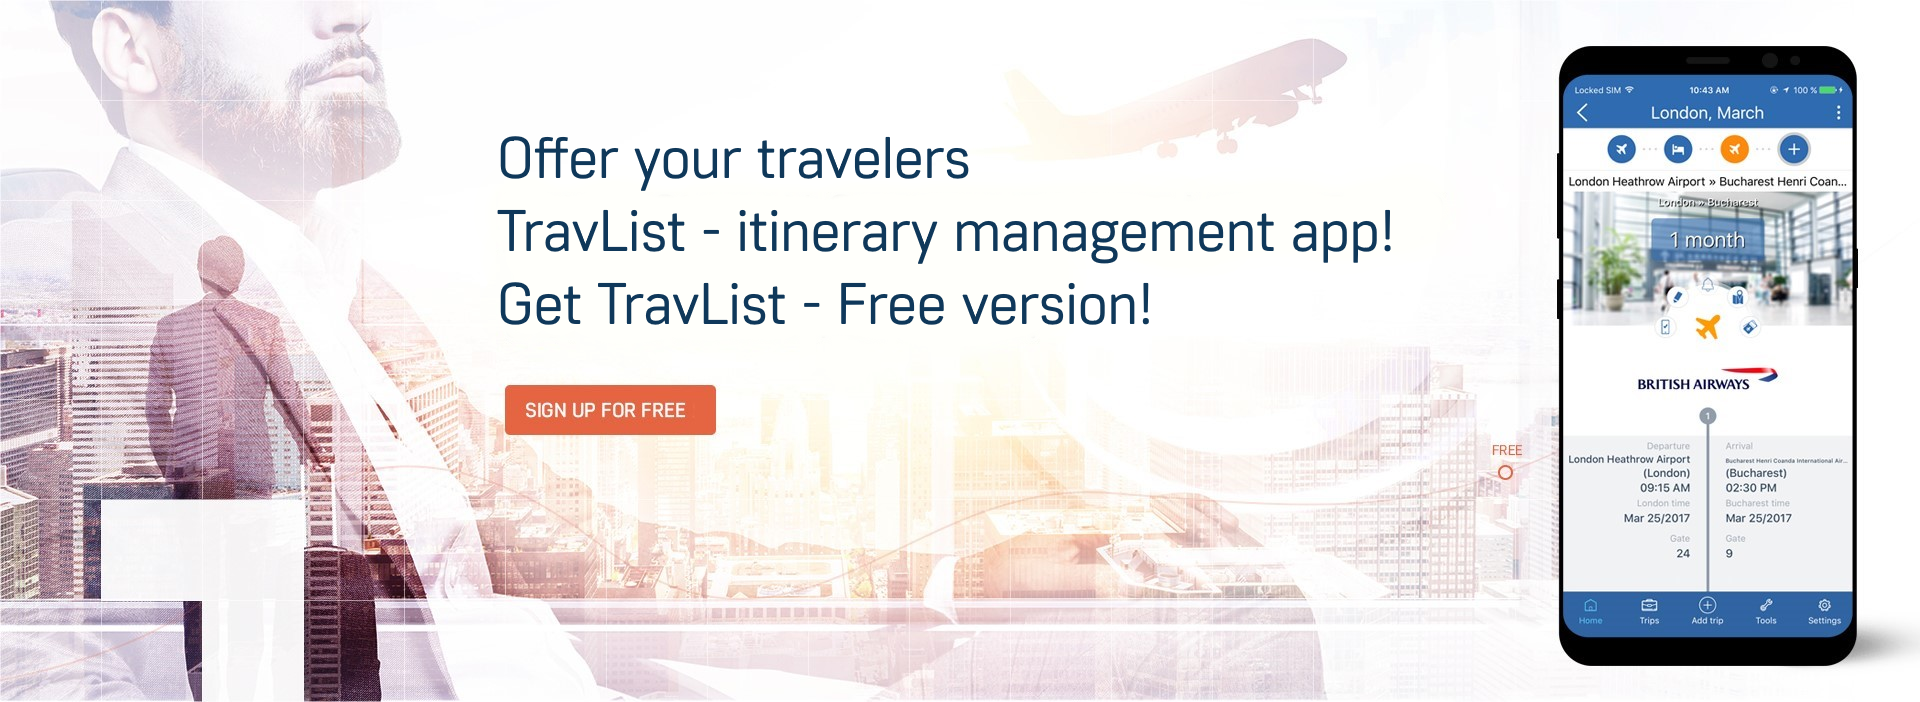 TravList - Itinerary Management Mobile App